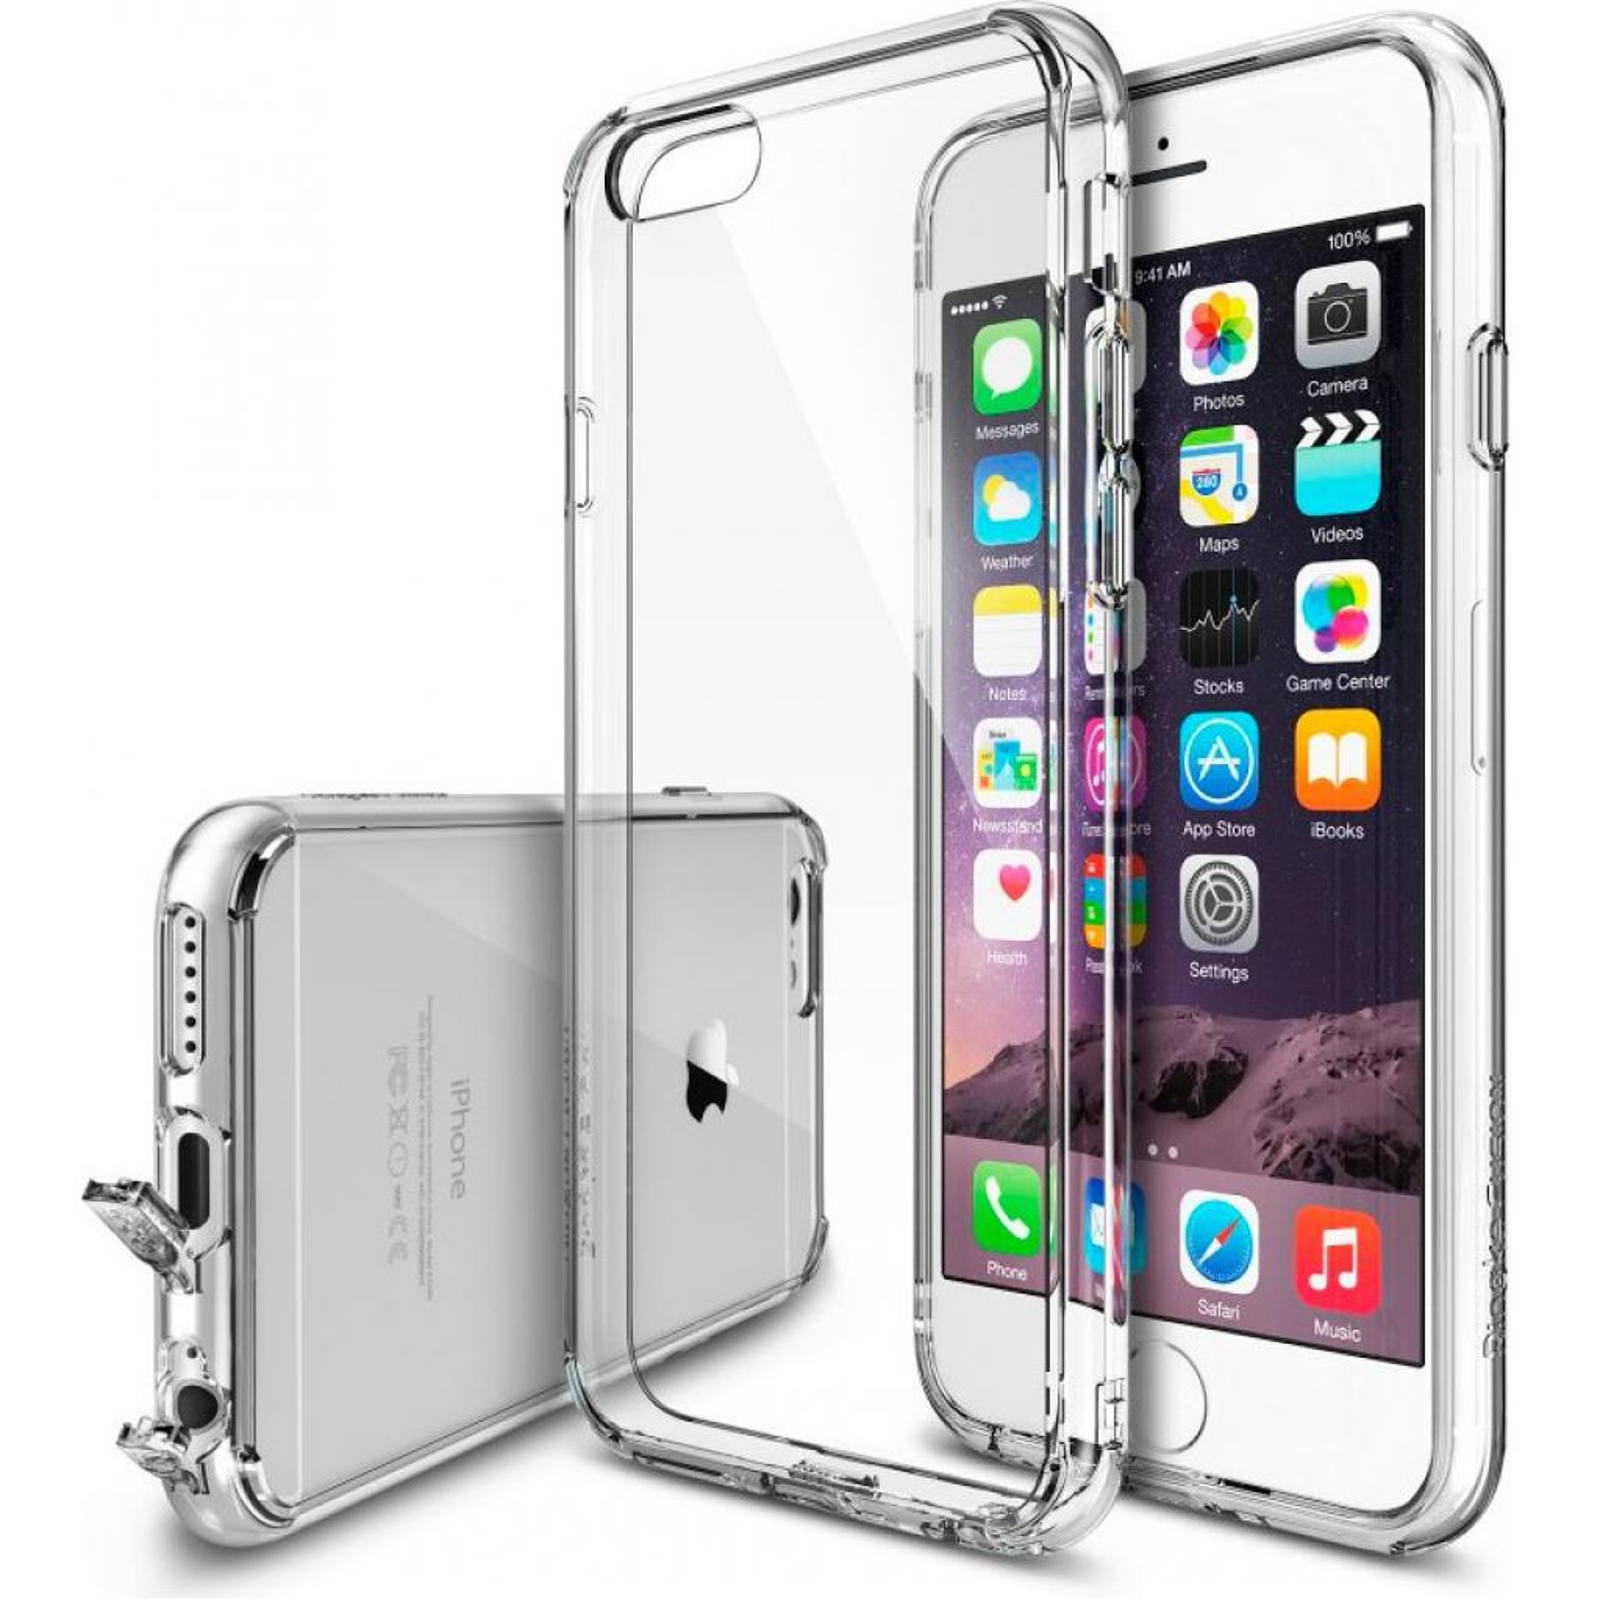 Чехол для моб. телефона Ringke Fusion для Apple iPhone 6/6S (Crystal View) (550074)